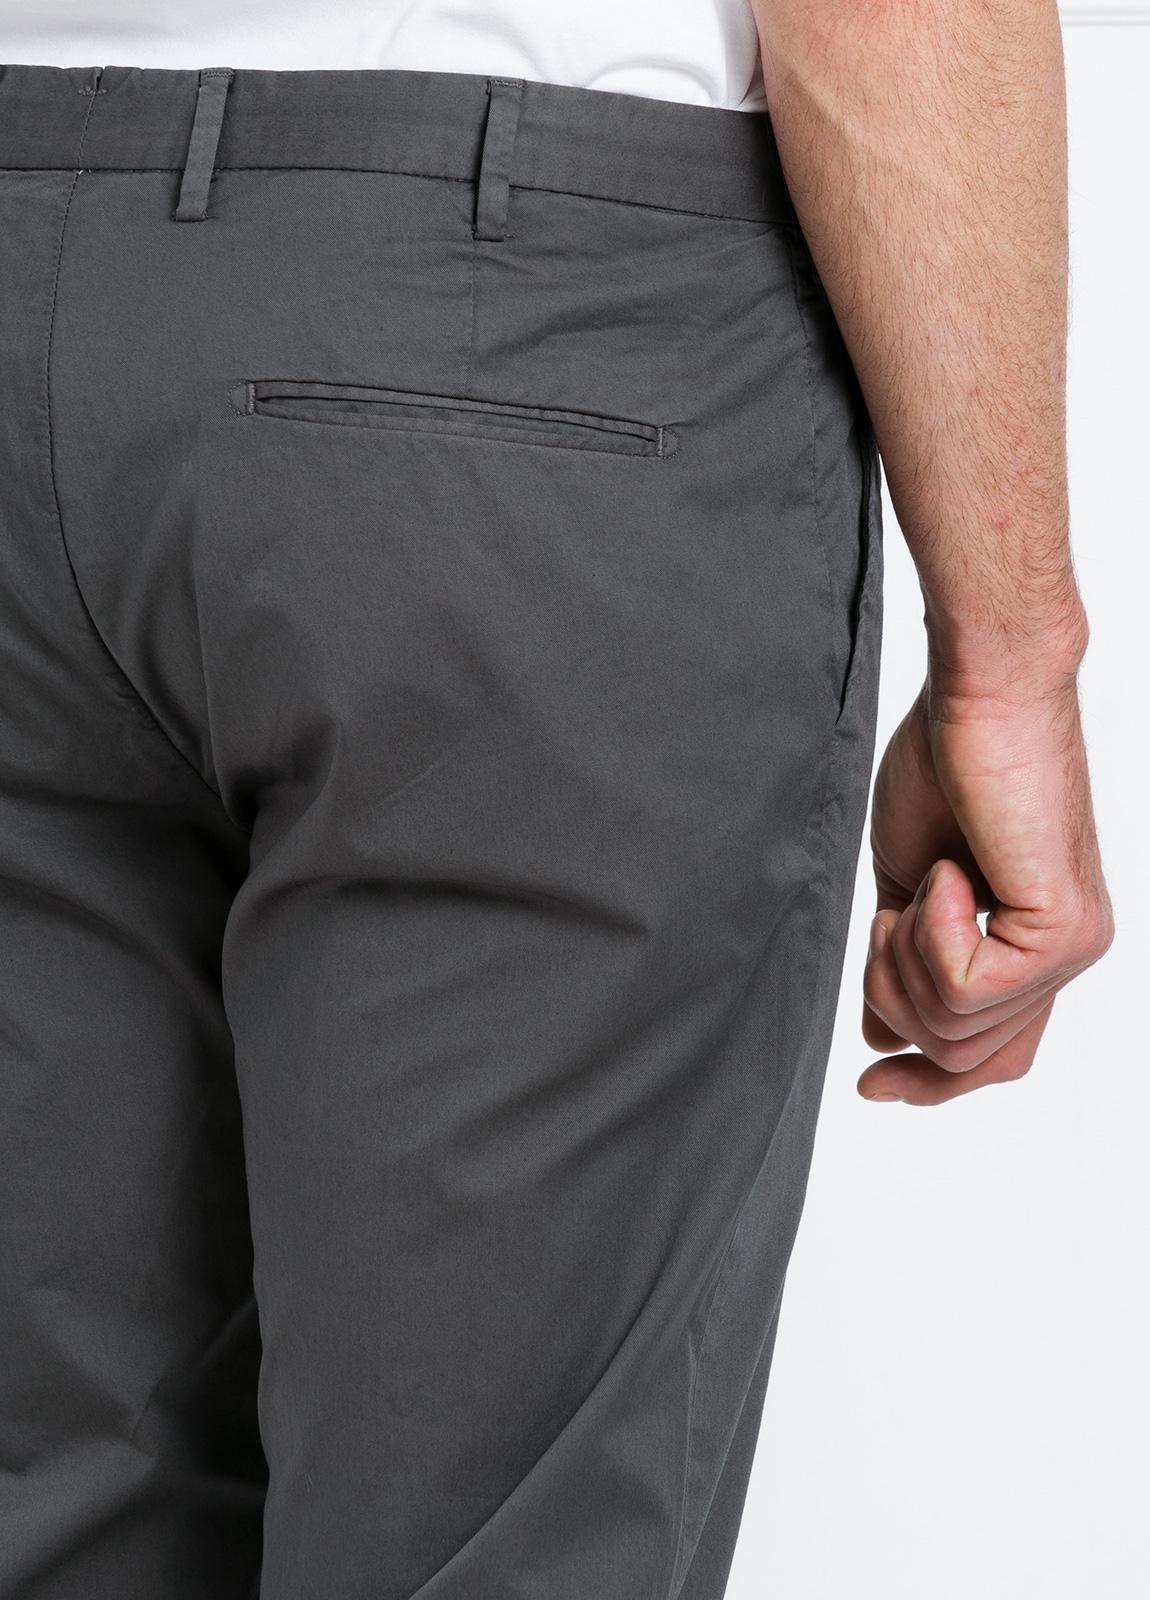 Pantalón chino REGULAR FIT modelo BRIAN color gris oscuro. 97% Algodón gabardina 3% Elastán. - Ítem2